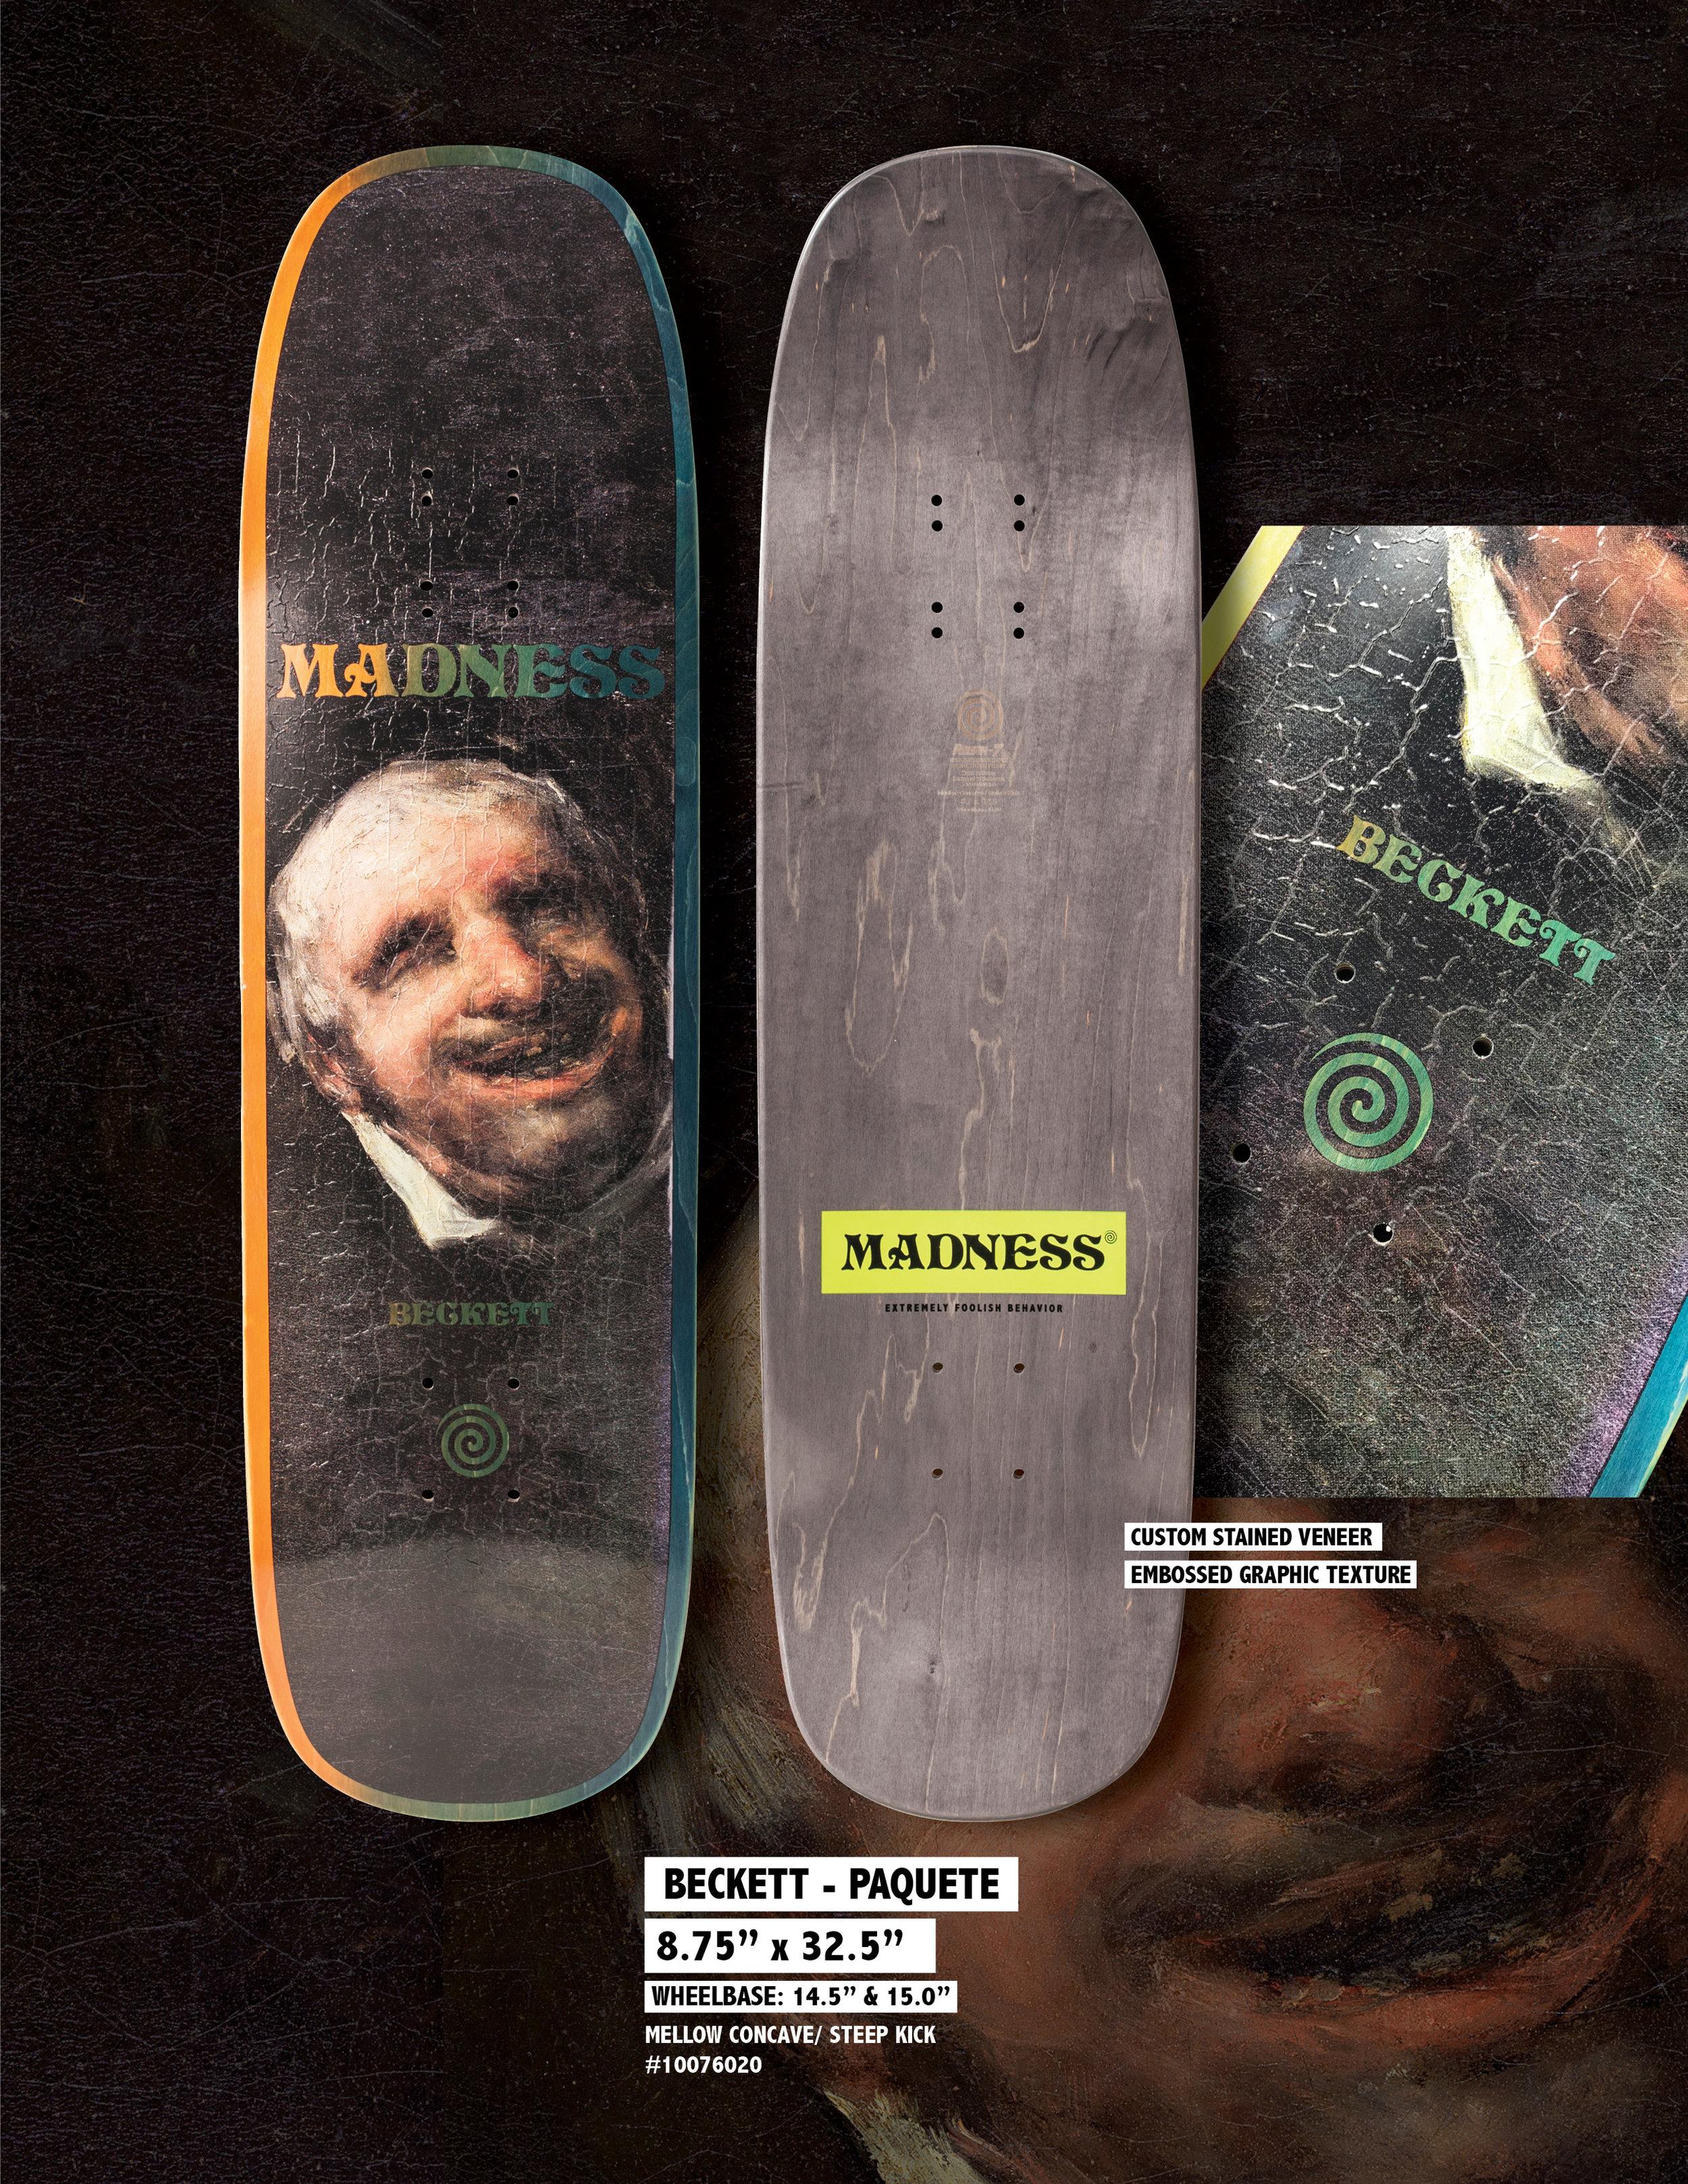 Madness_Spring_195_Sam_Beckett_Paquete_Deck.jpg